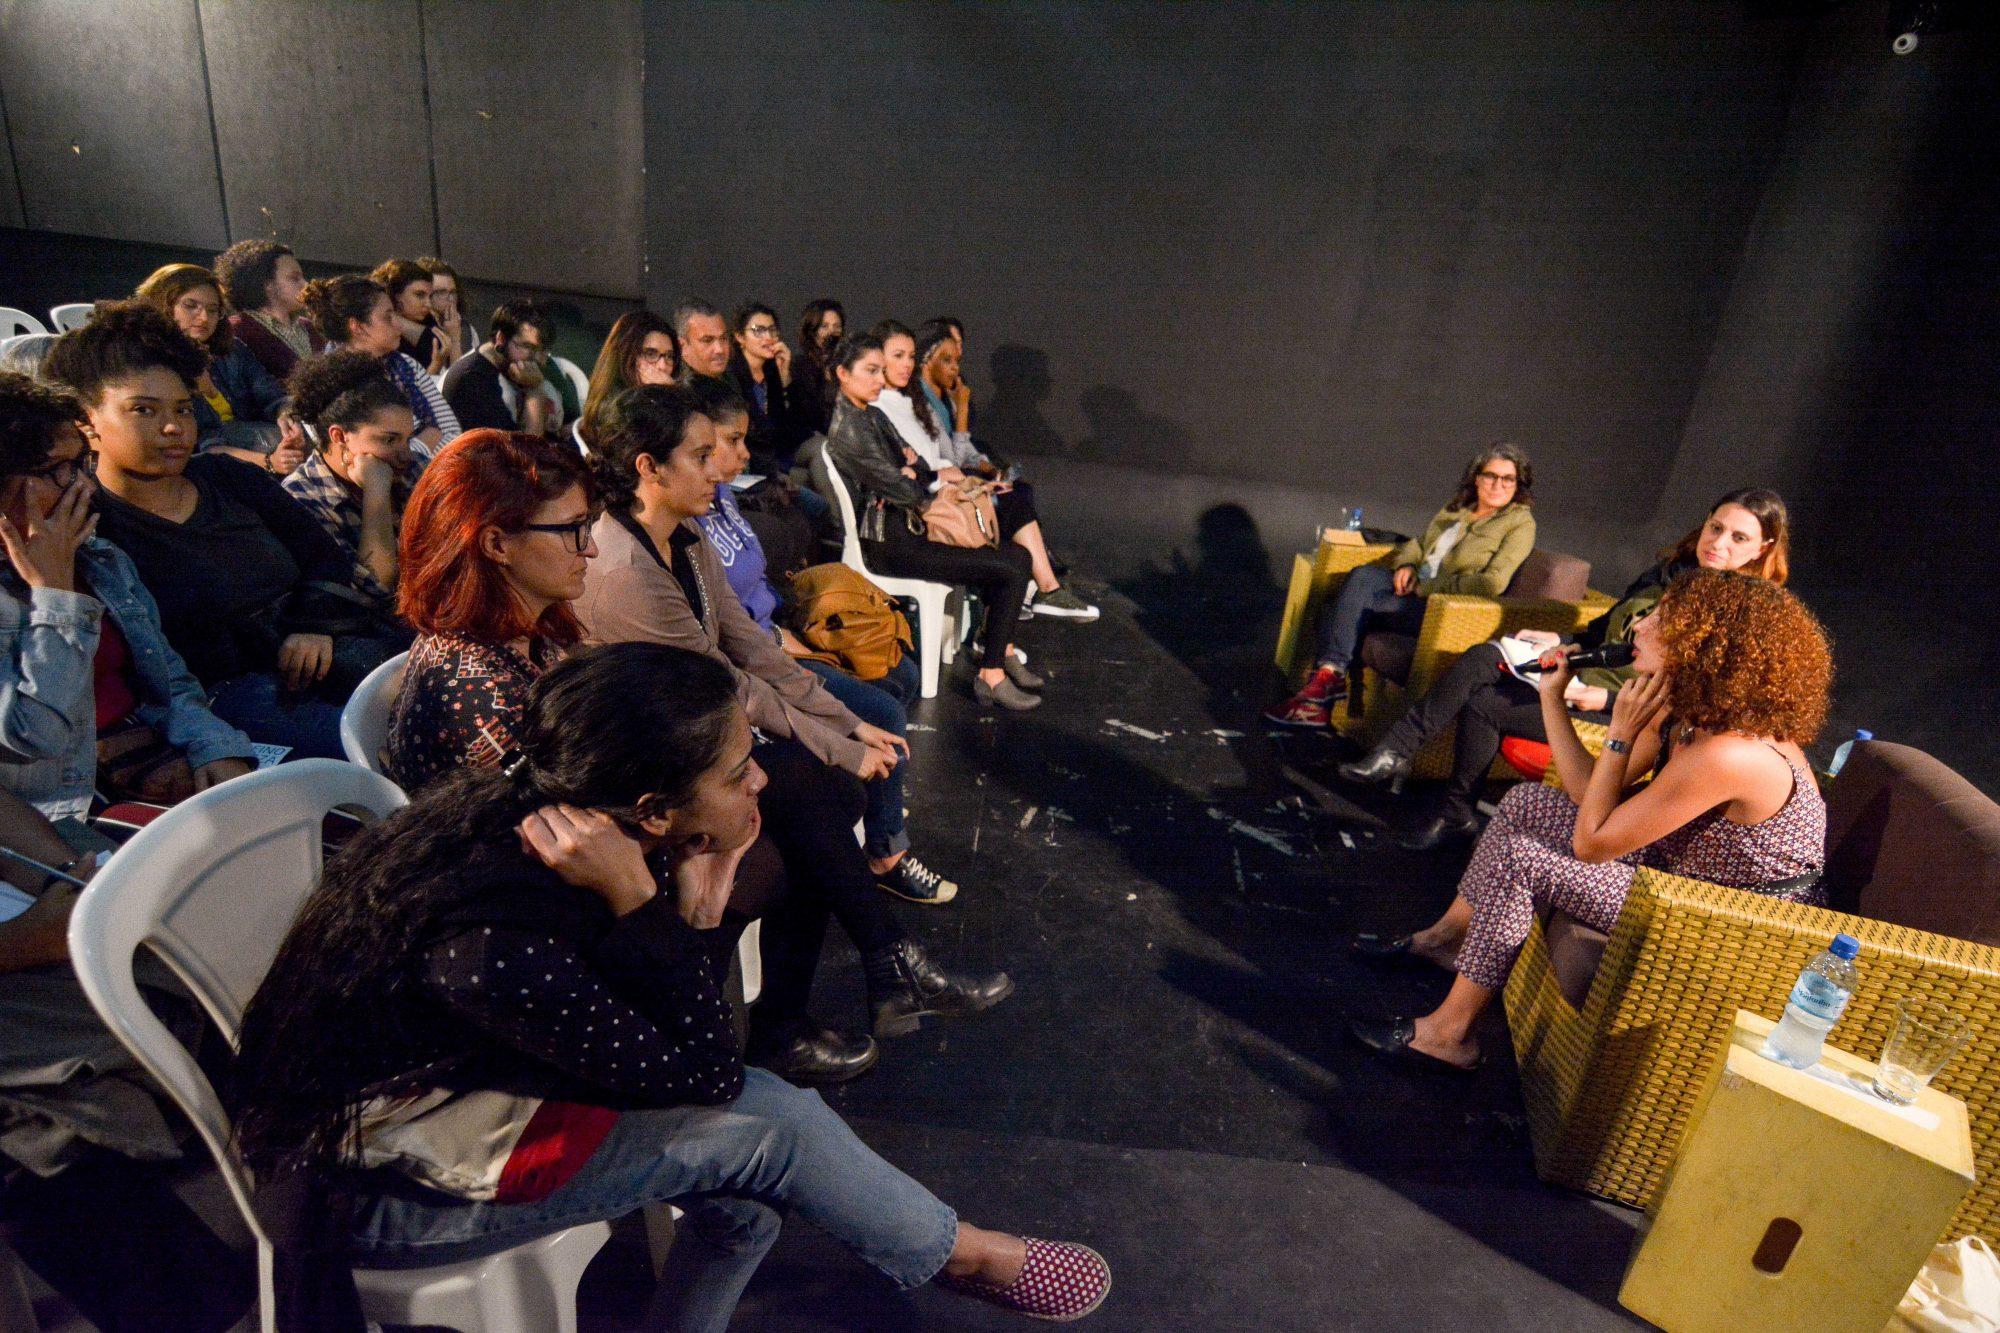 Semana de Cinema e Mercado debate a presença feminina no cinema brasileiro